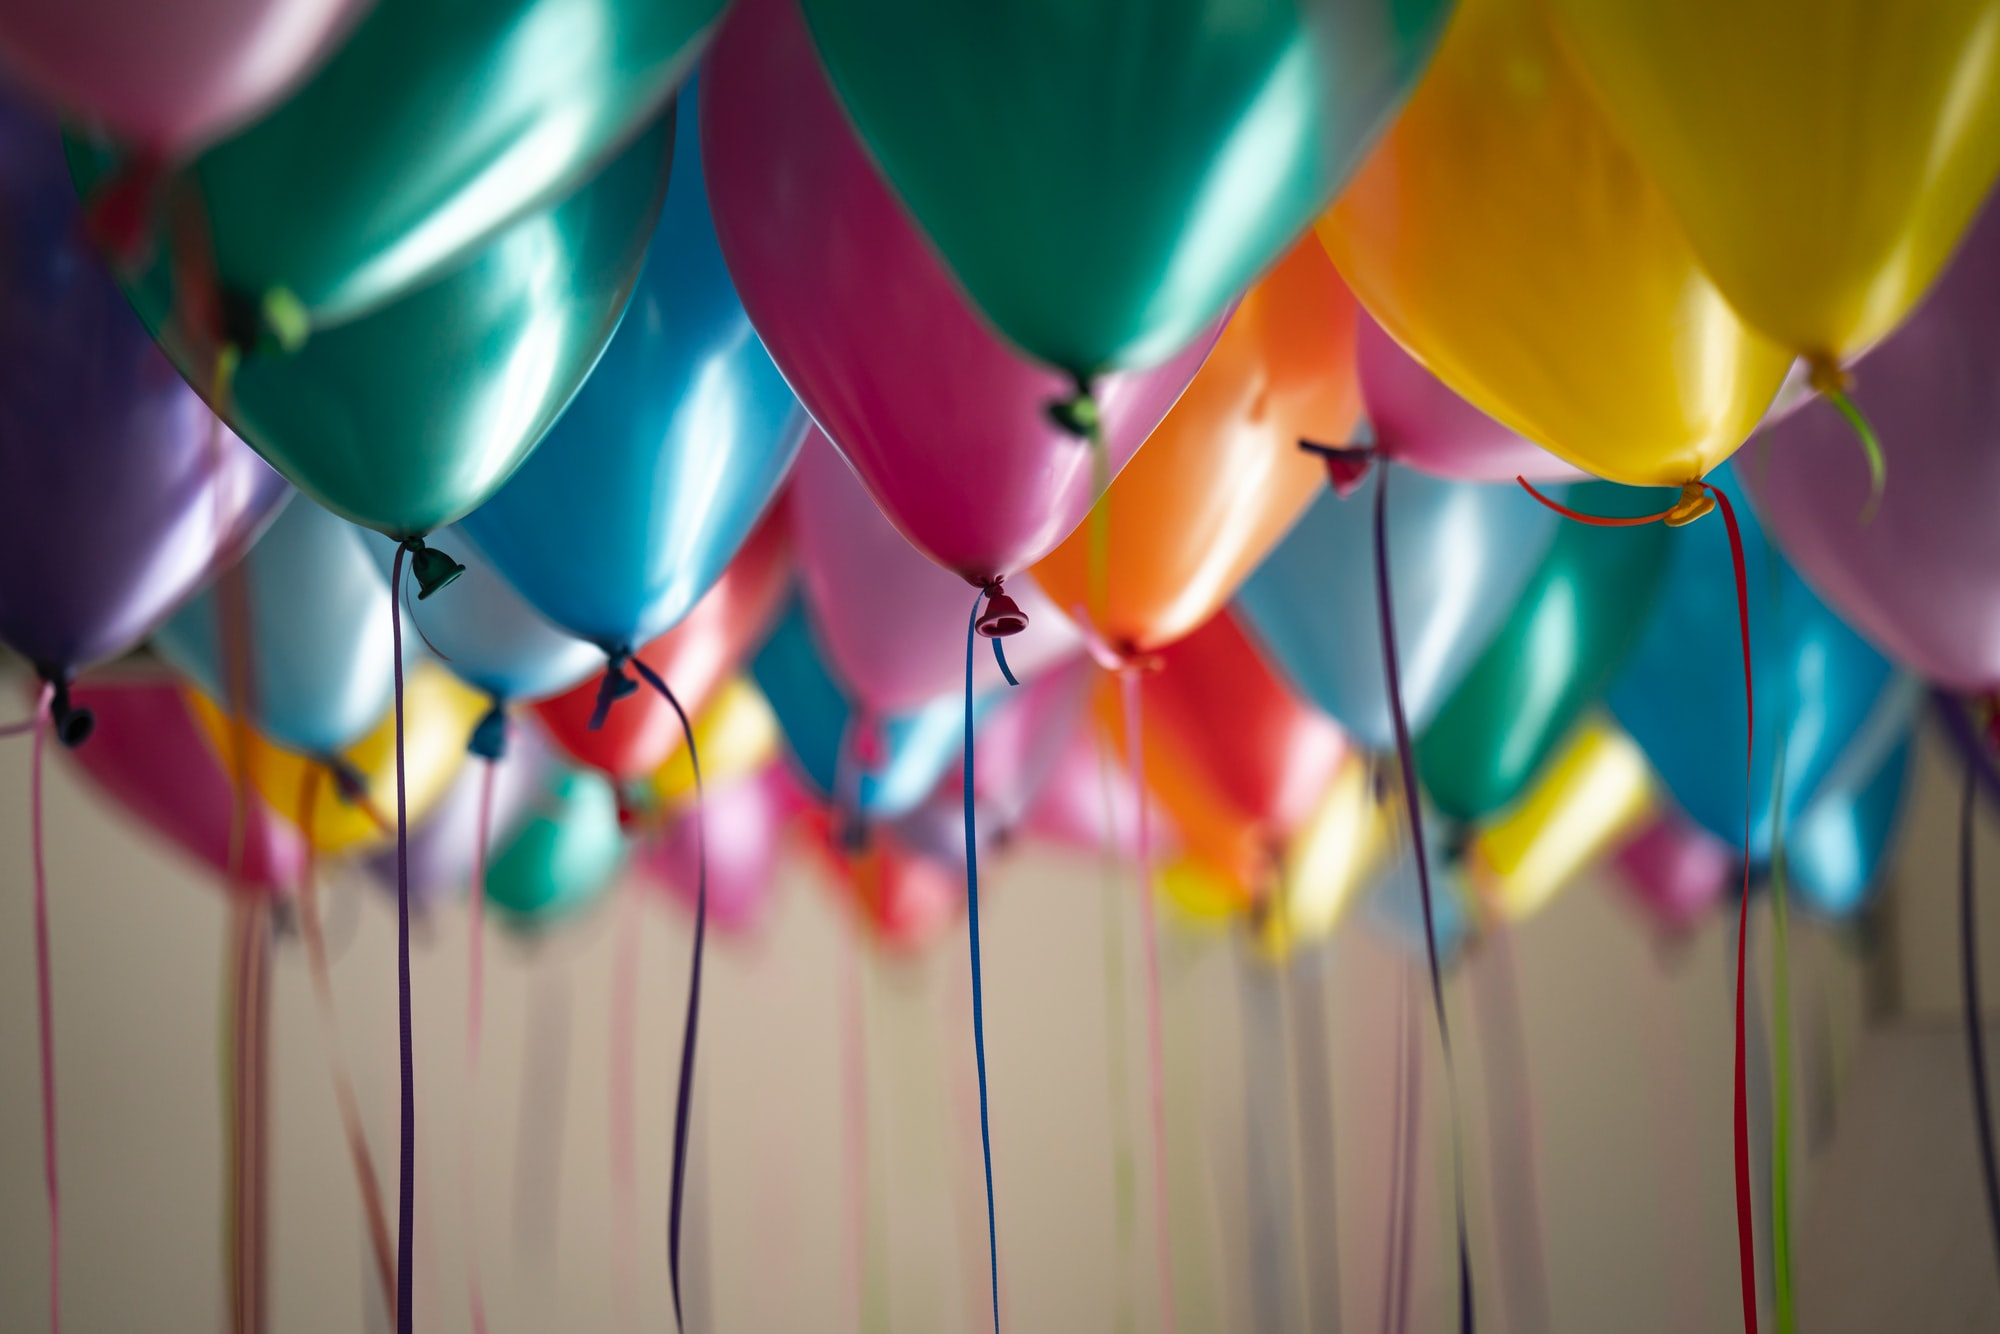 The Ballons